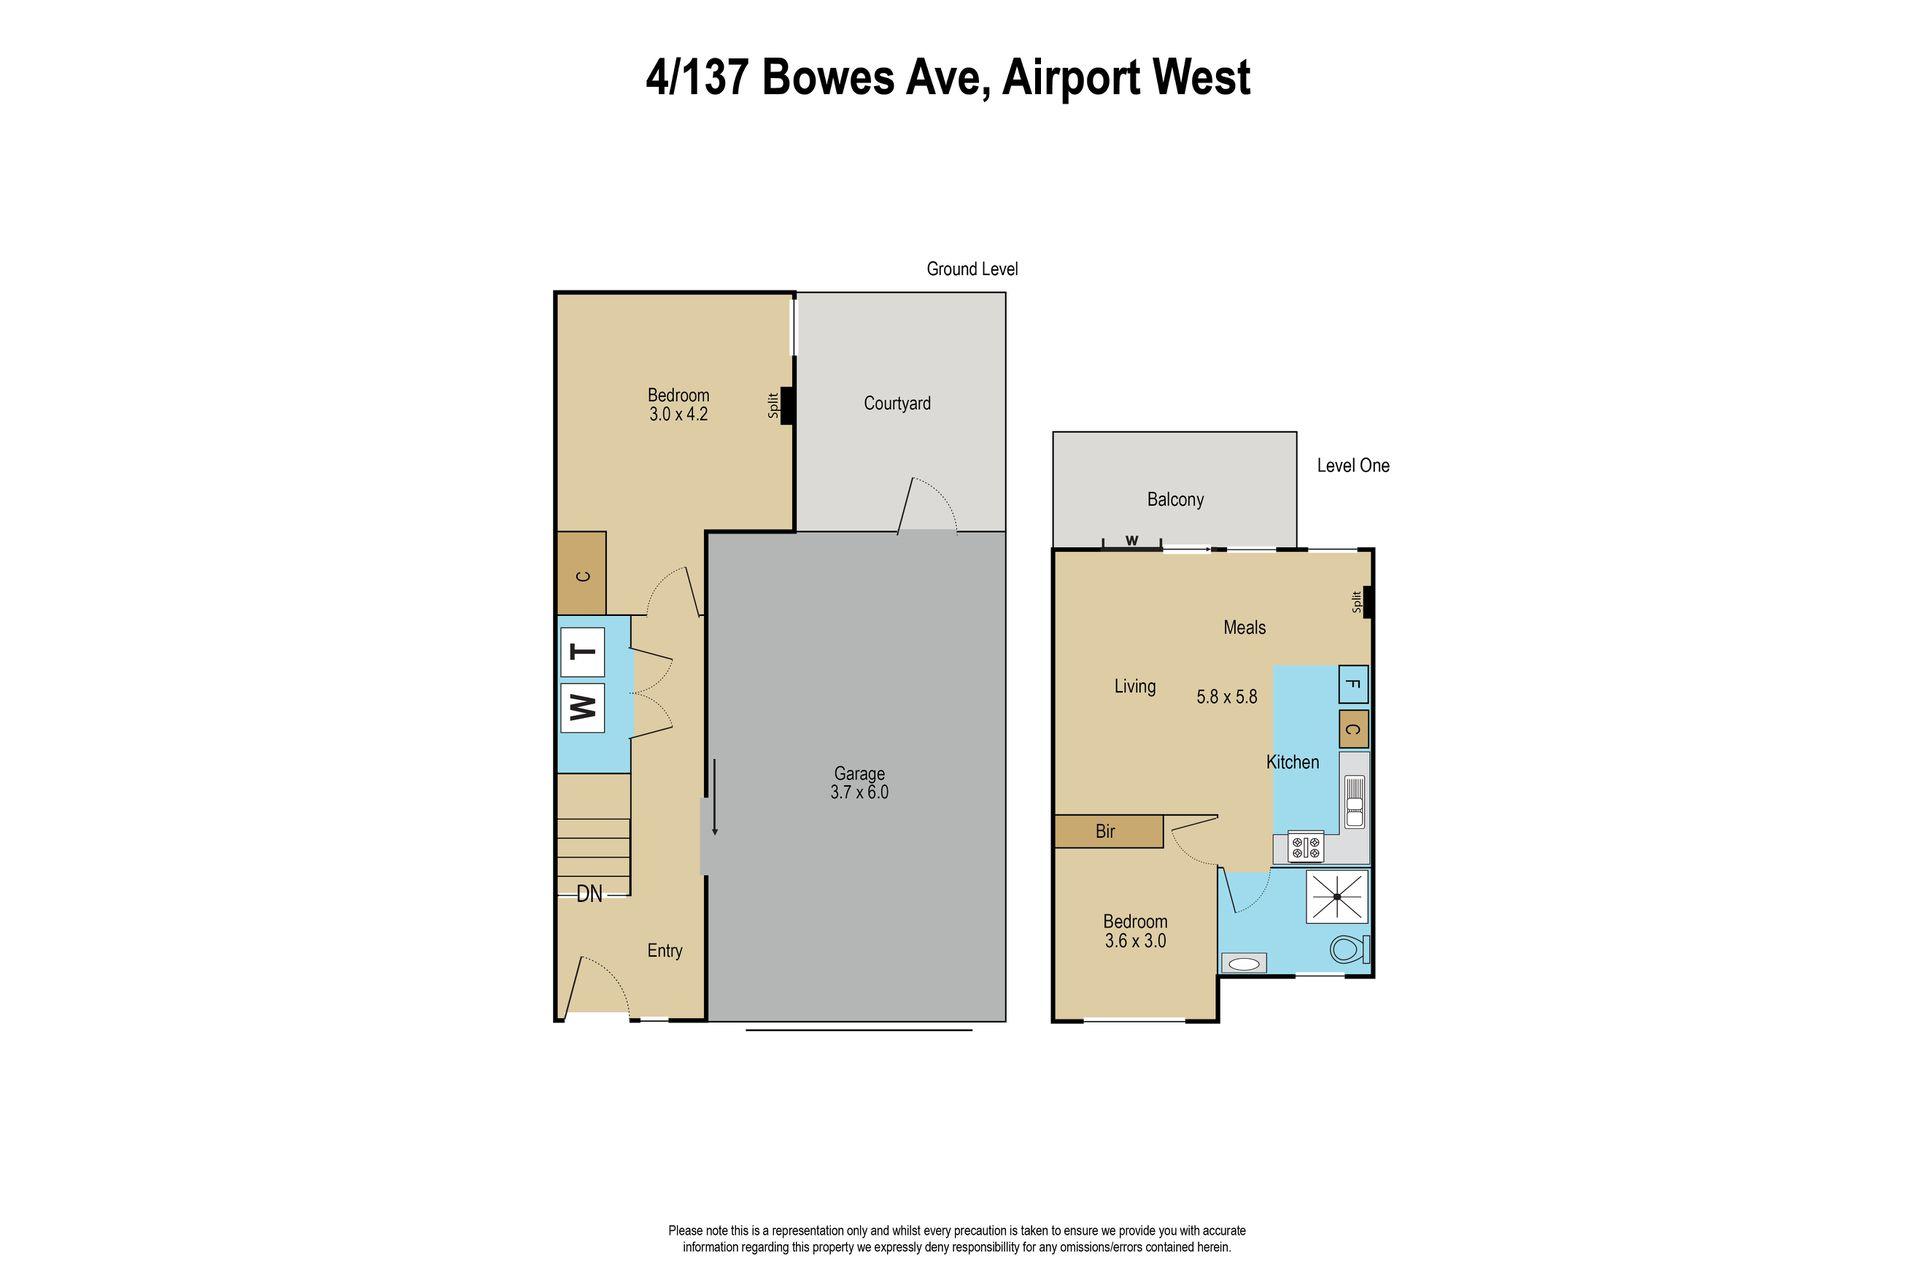 4 / 137 Bowes Avenue, Airport West